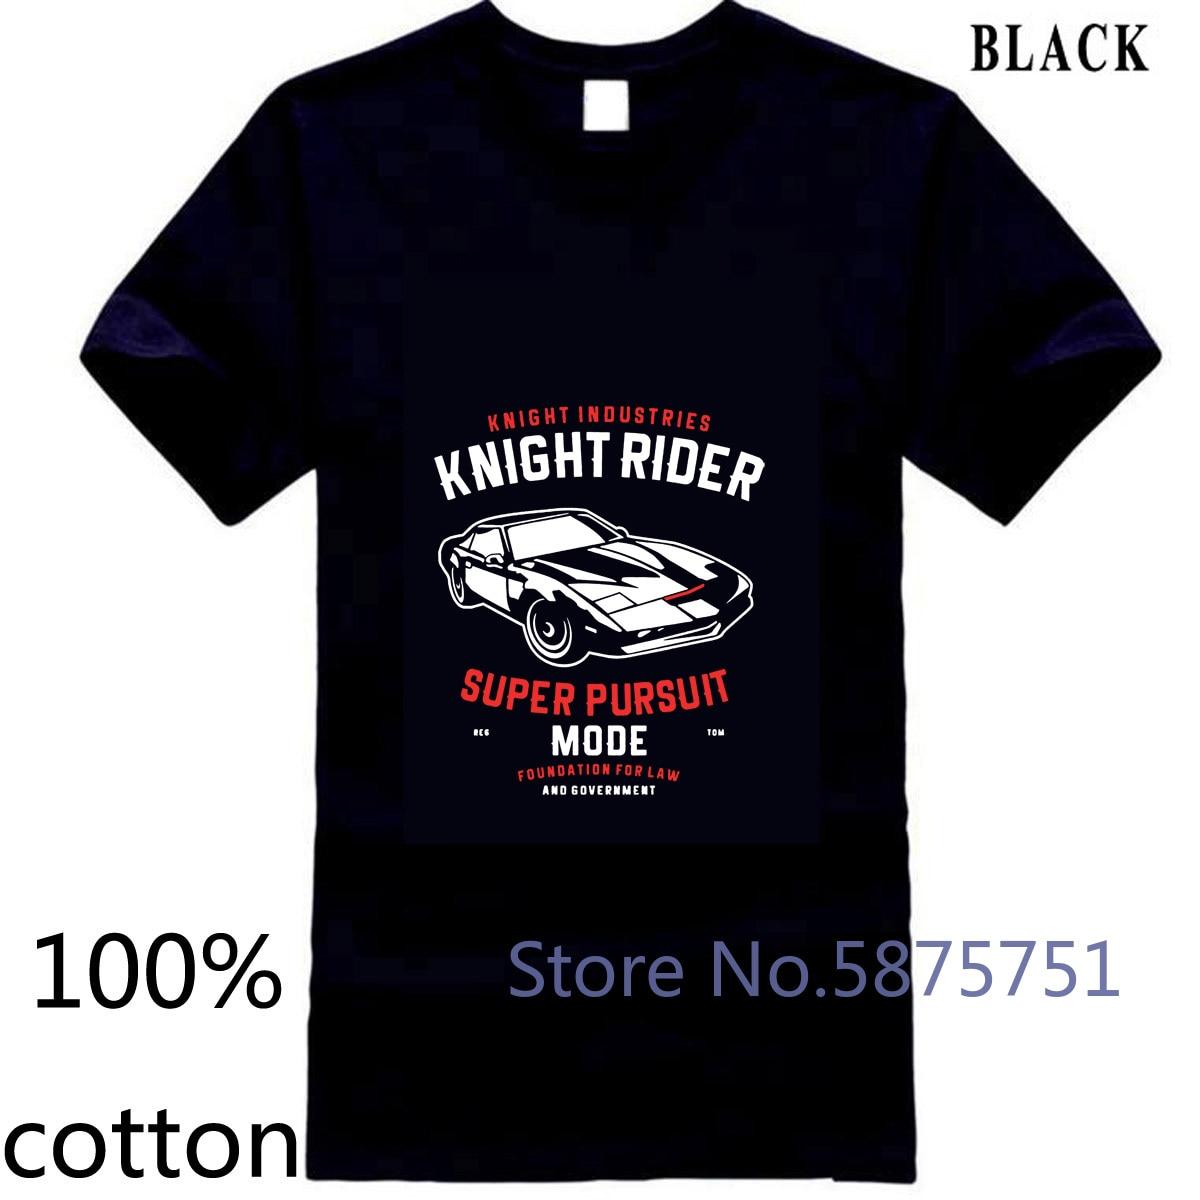 Knight Rider Premium ,Hasselhoff,Baywatch,80er Kult Neu Siebdruck Kitt, camiseta para hombres, camisetas, camisetas, 100% de algodón